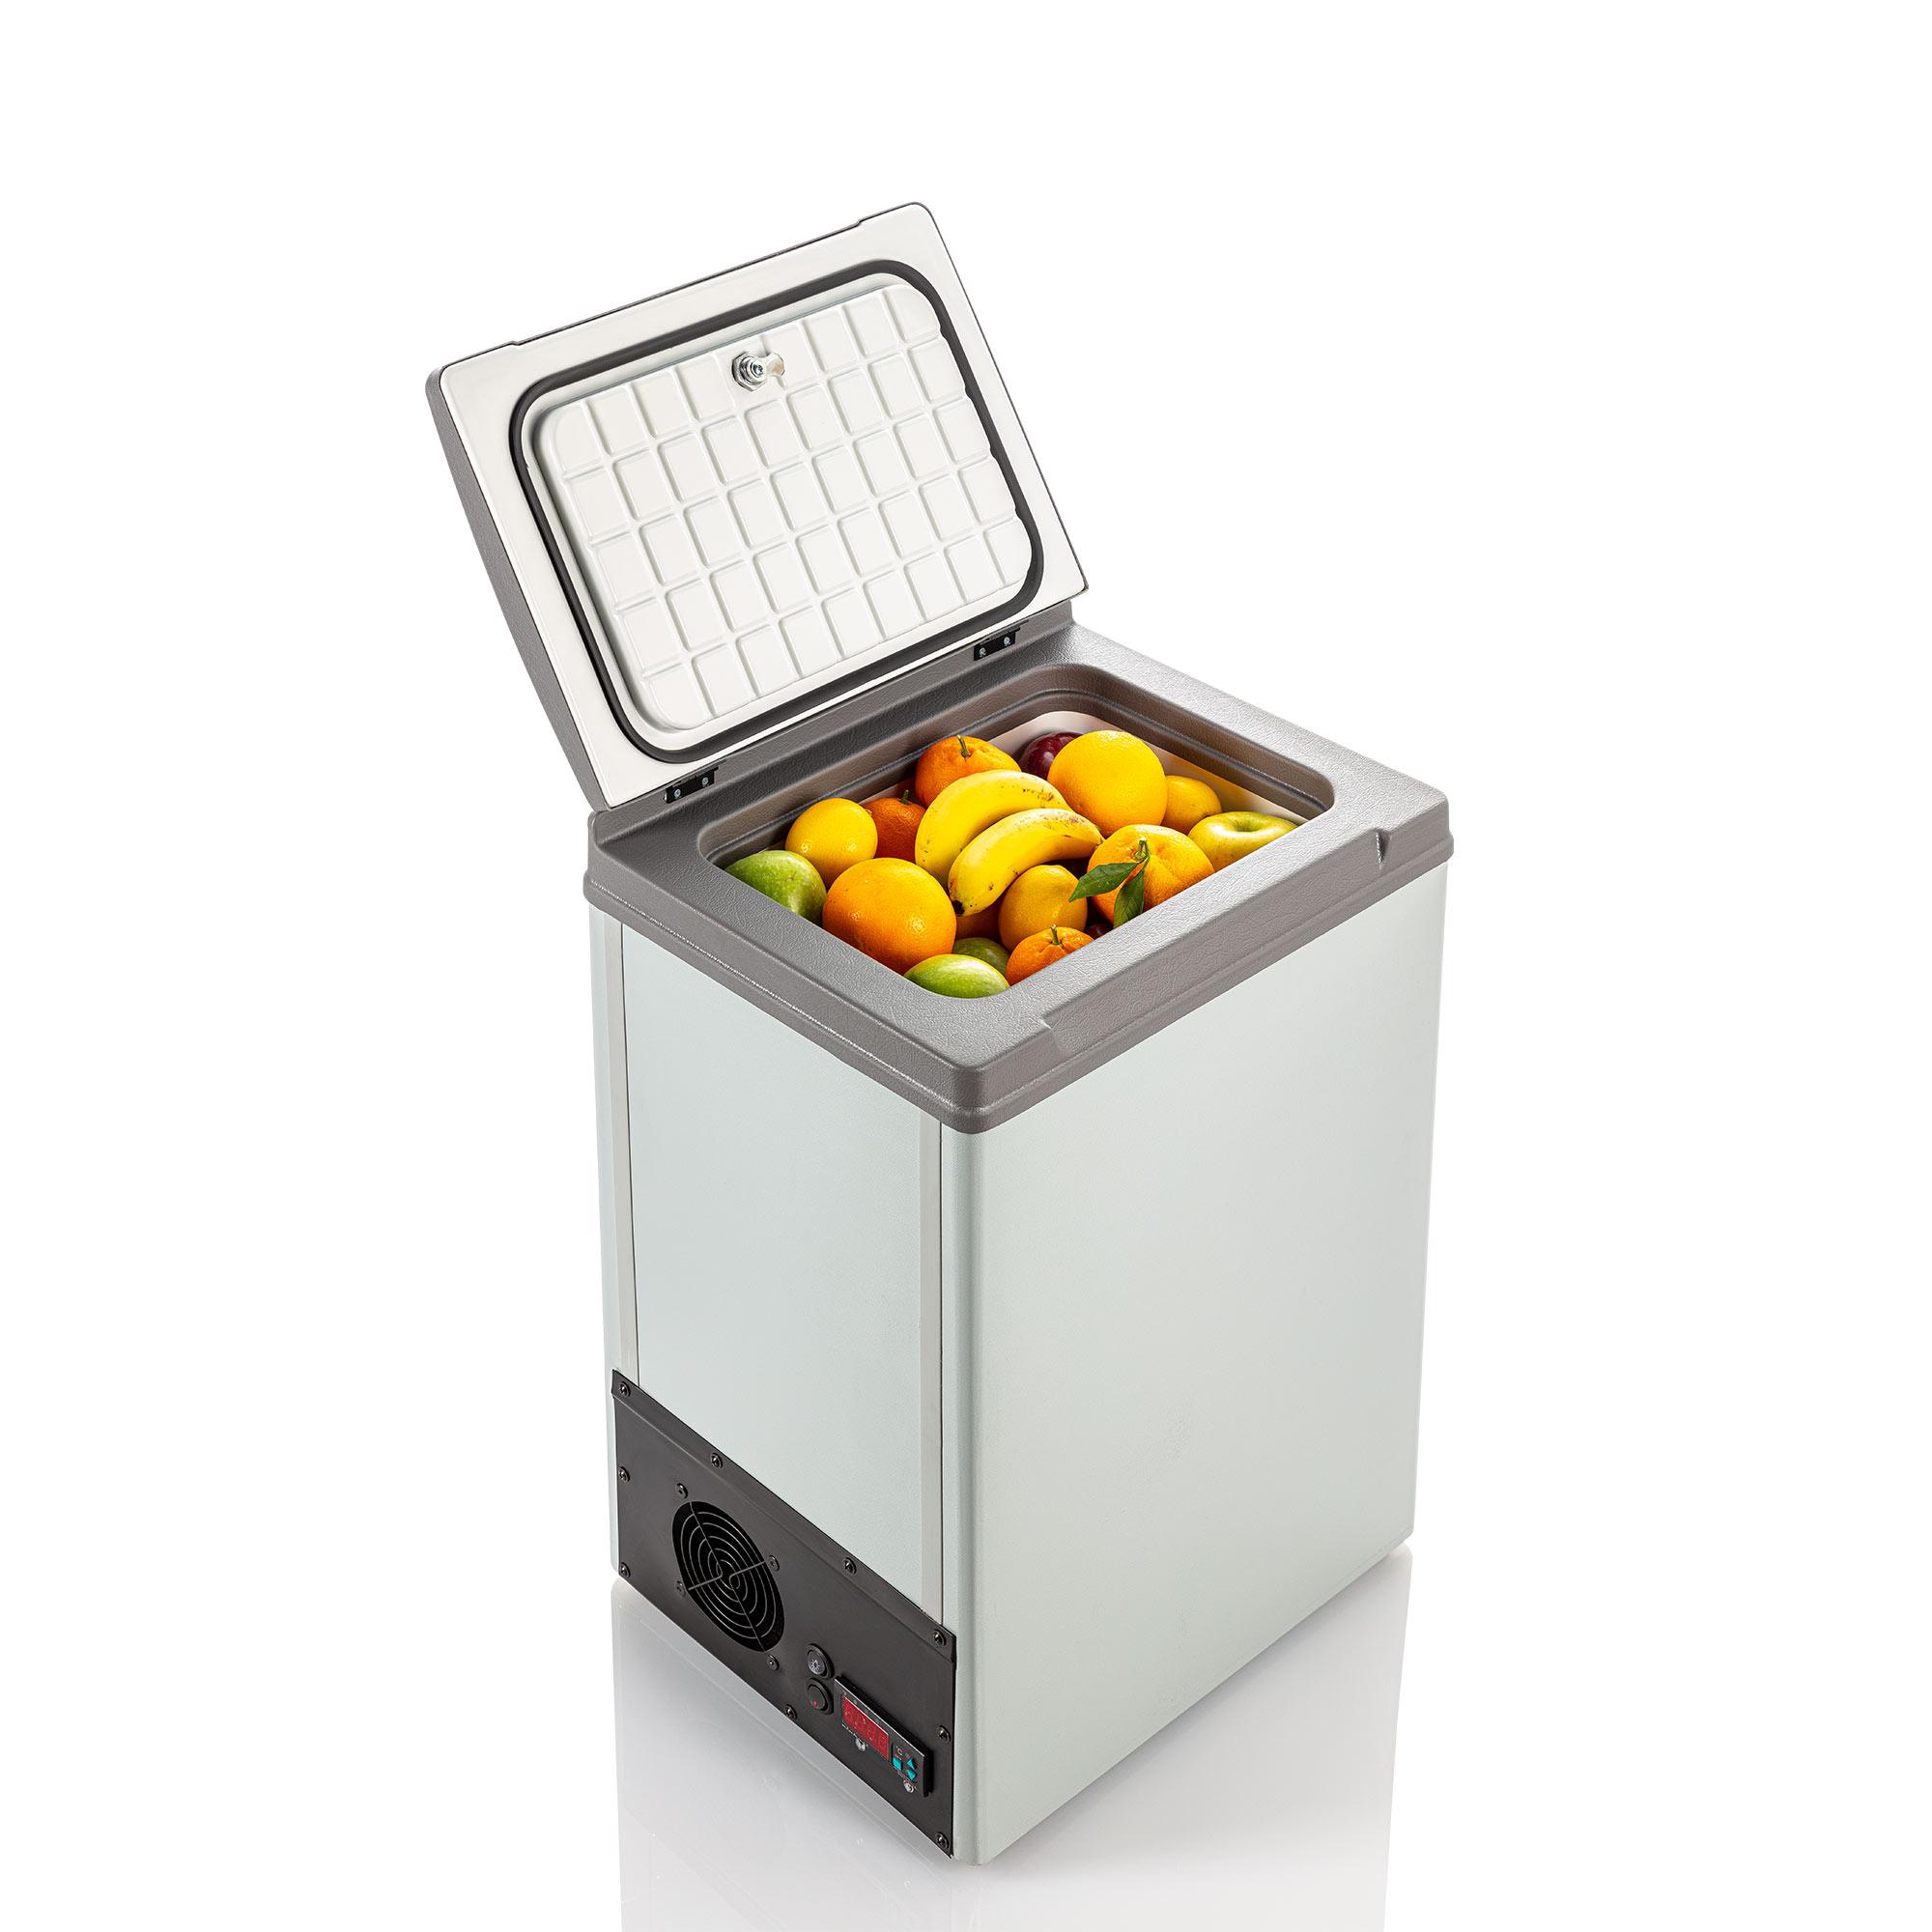 MPO 3258 28 LT Soğutucu Araç Buzdolabı